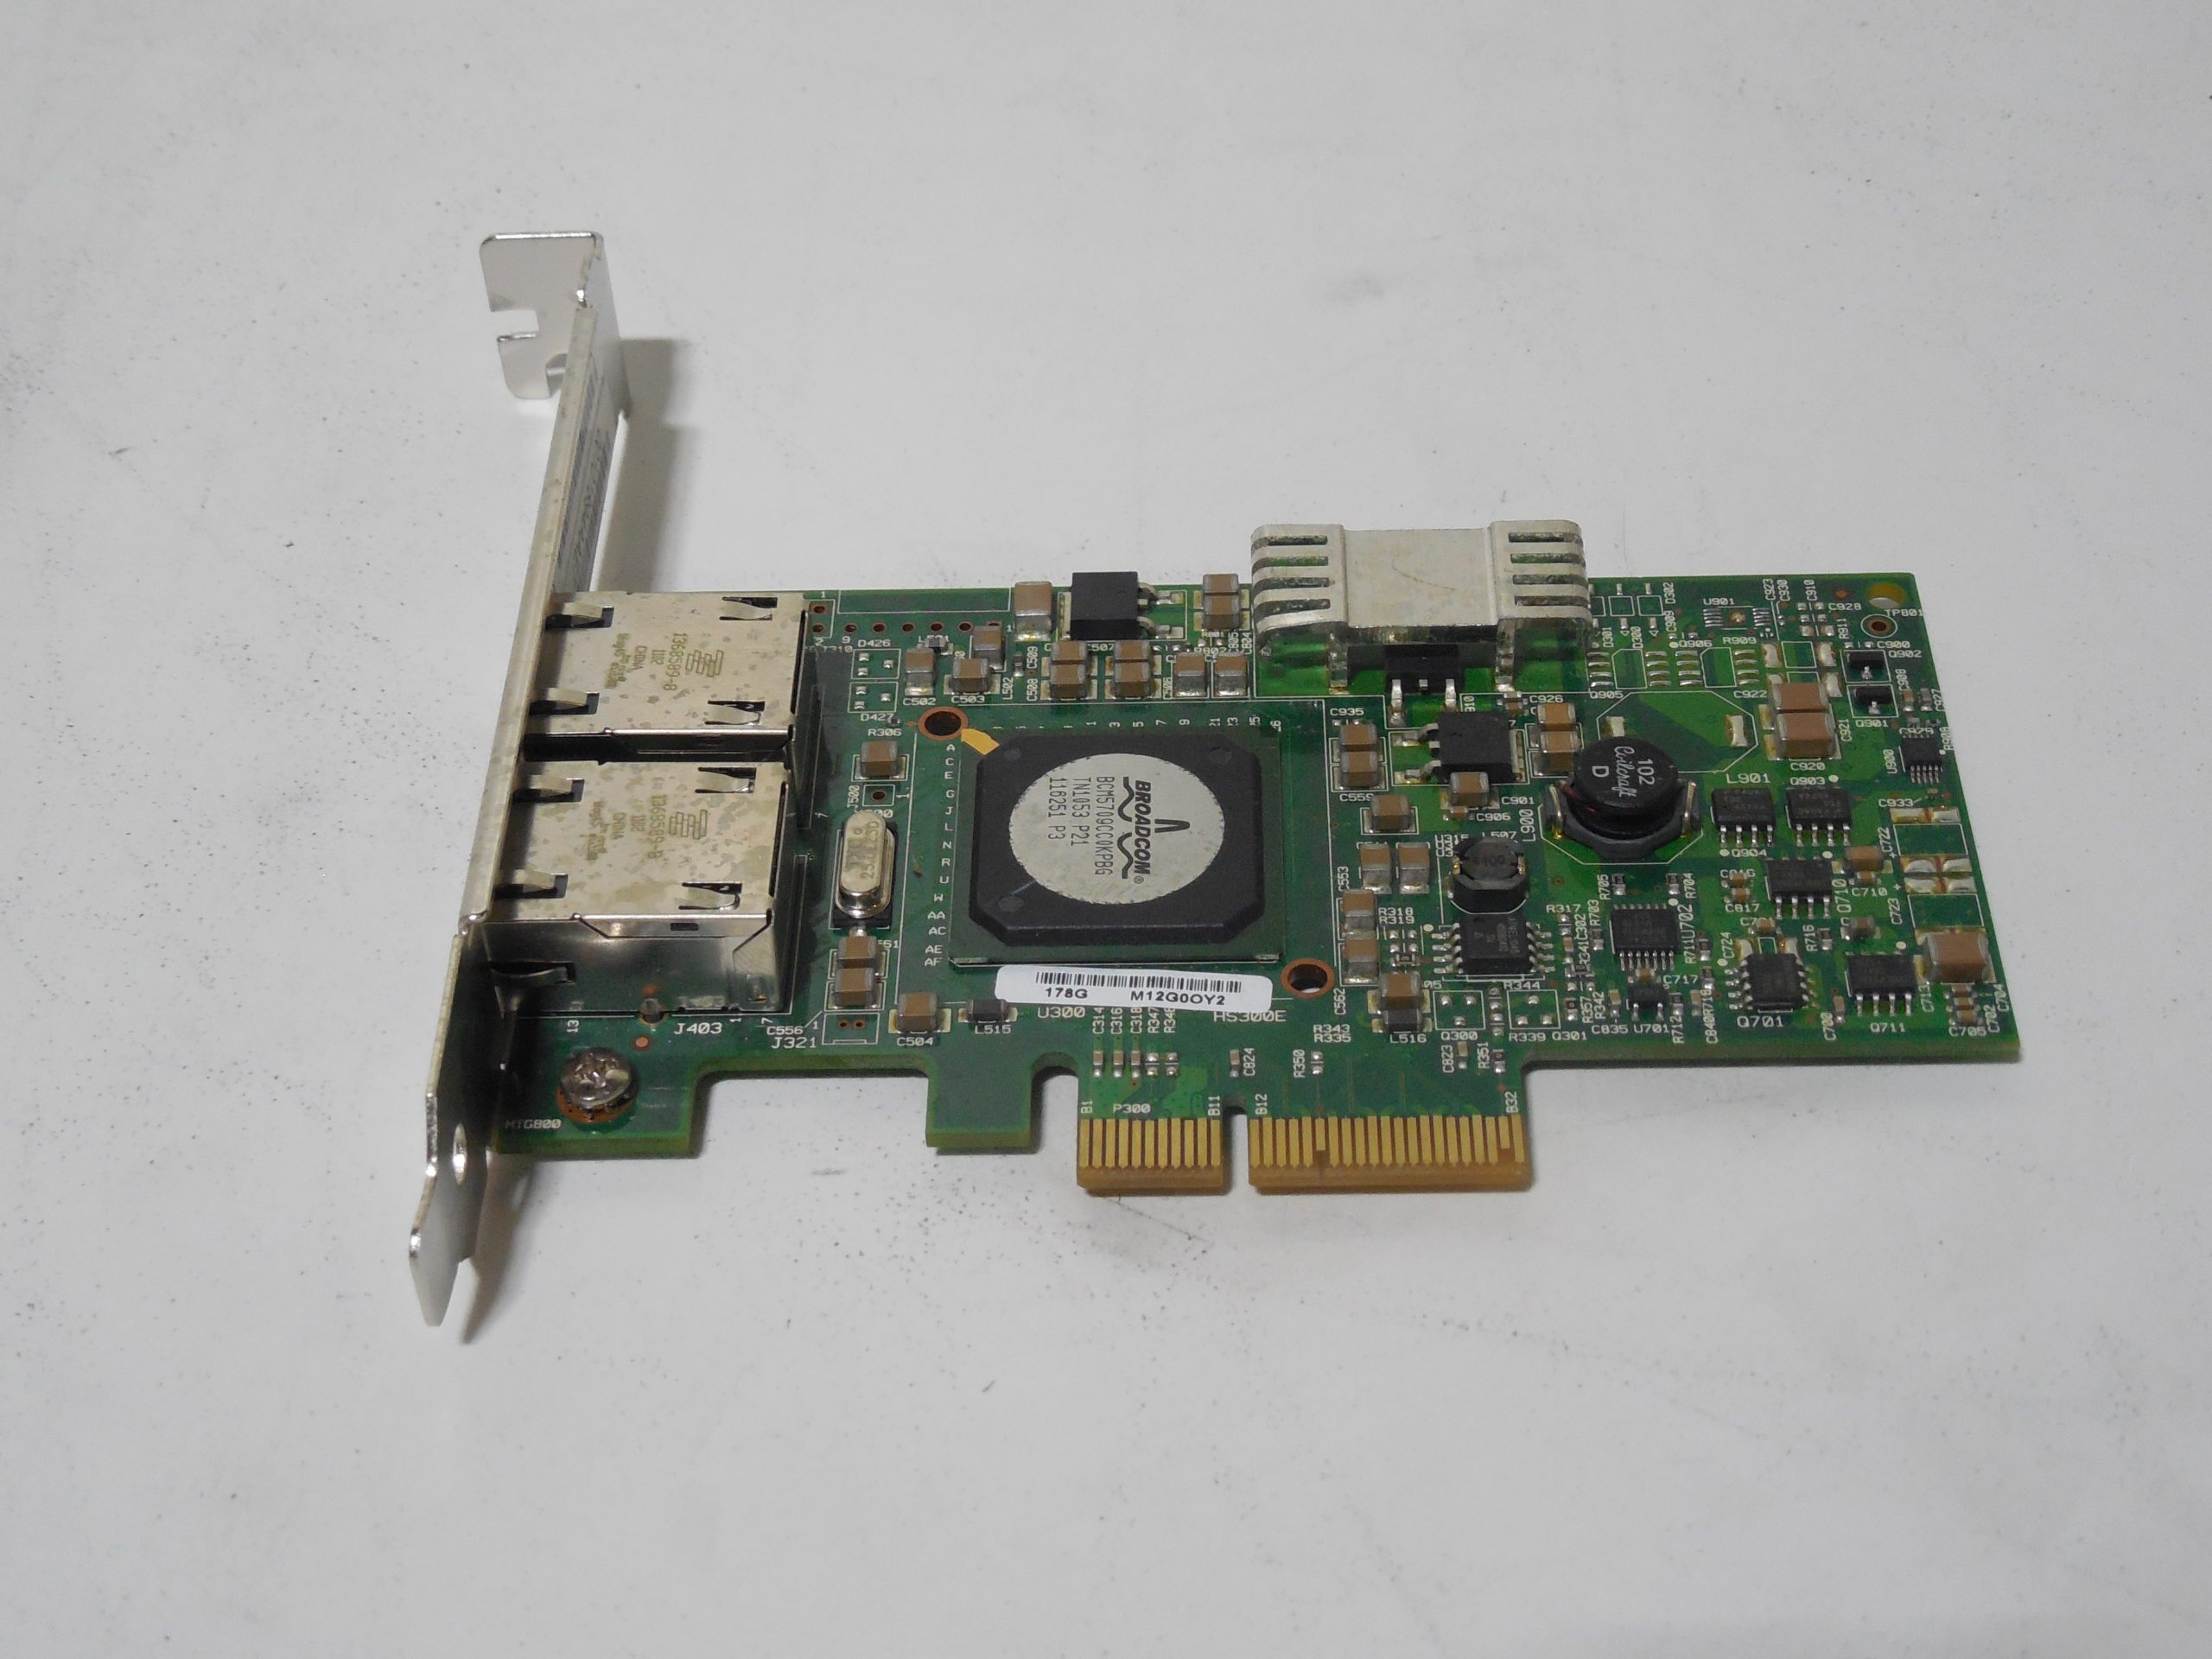 USB 2.0 Wireless WiFi Lan Card for HP-Compaq Presario SR1020NX